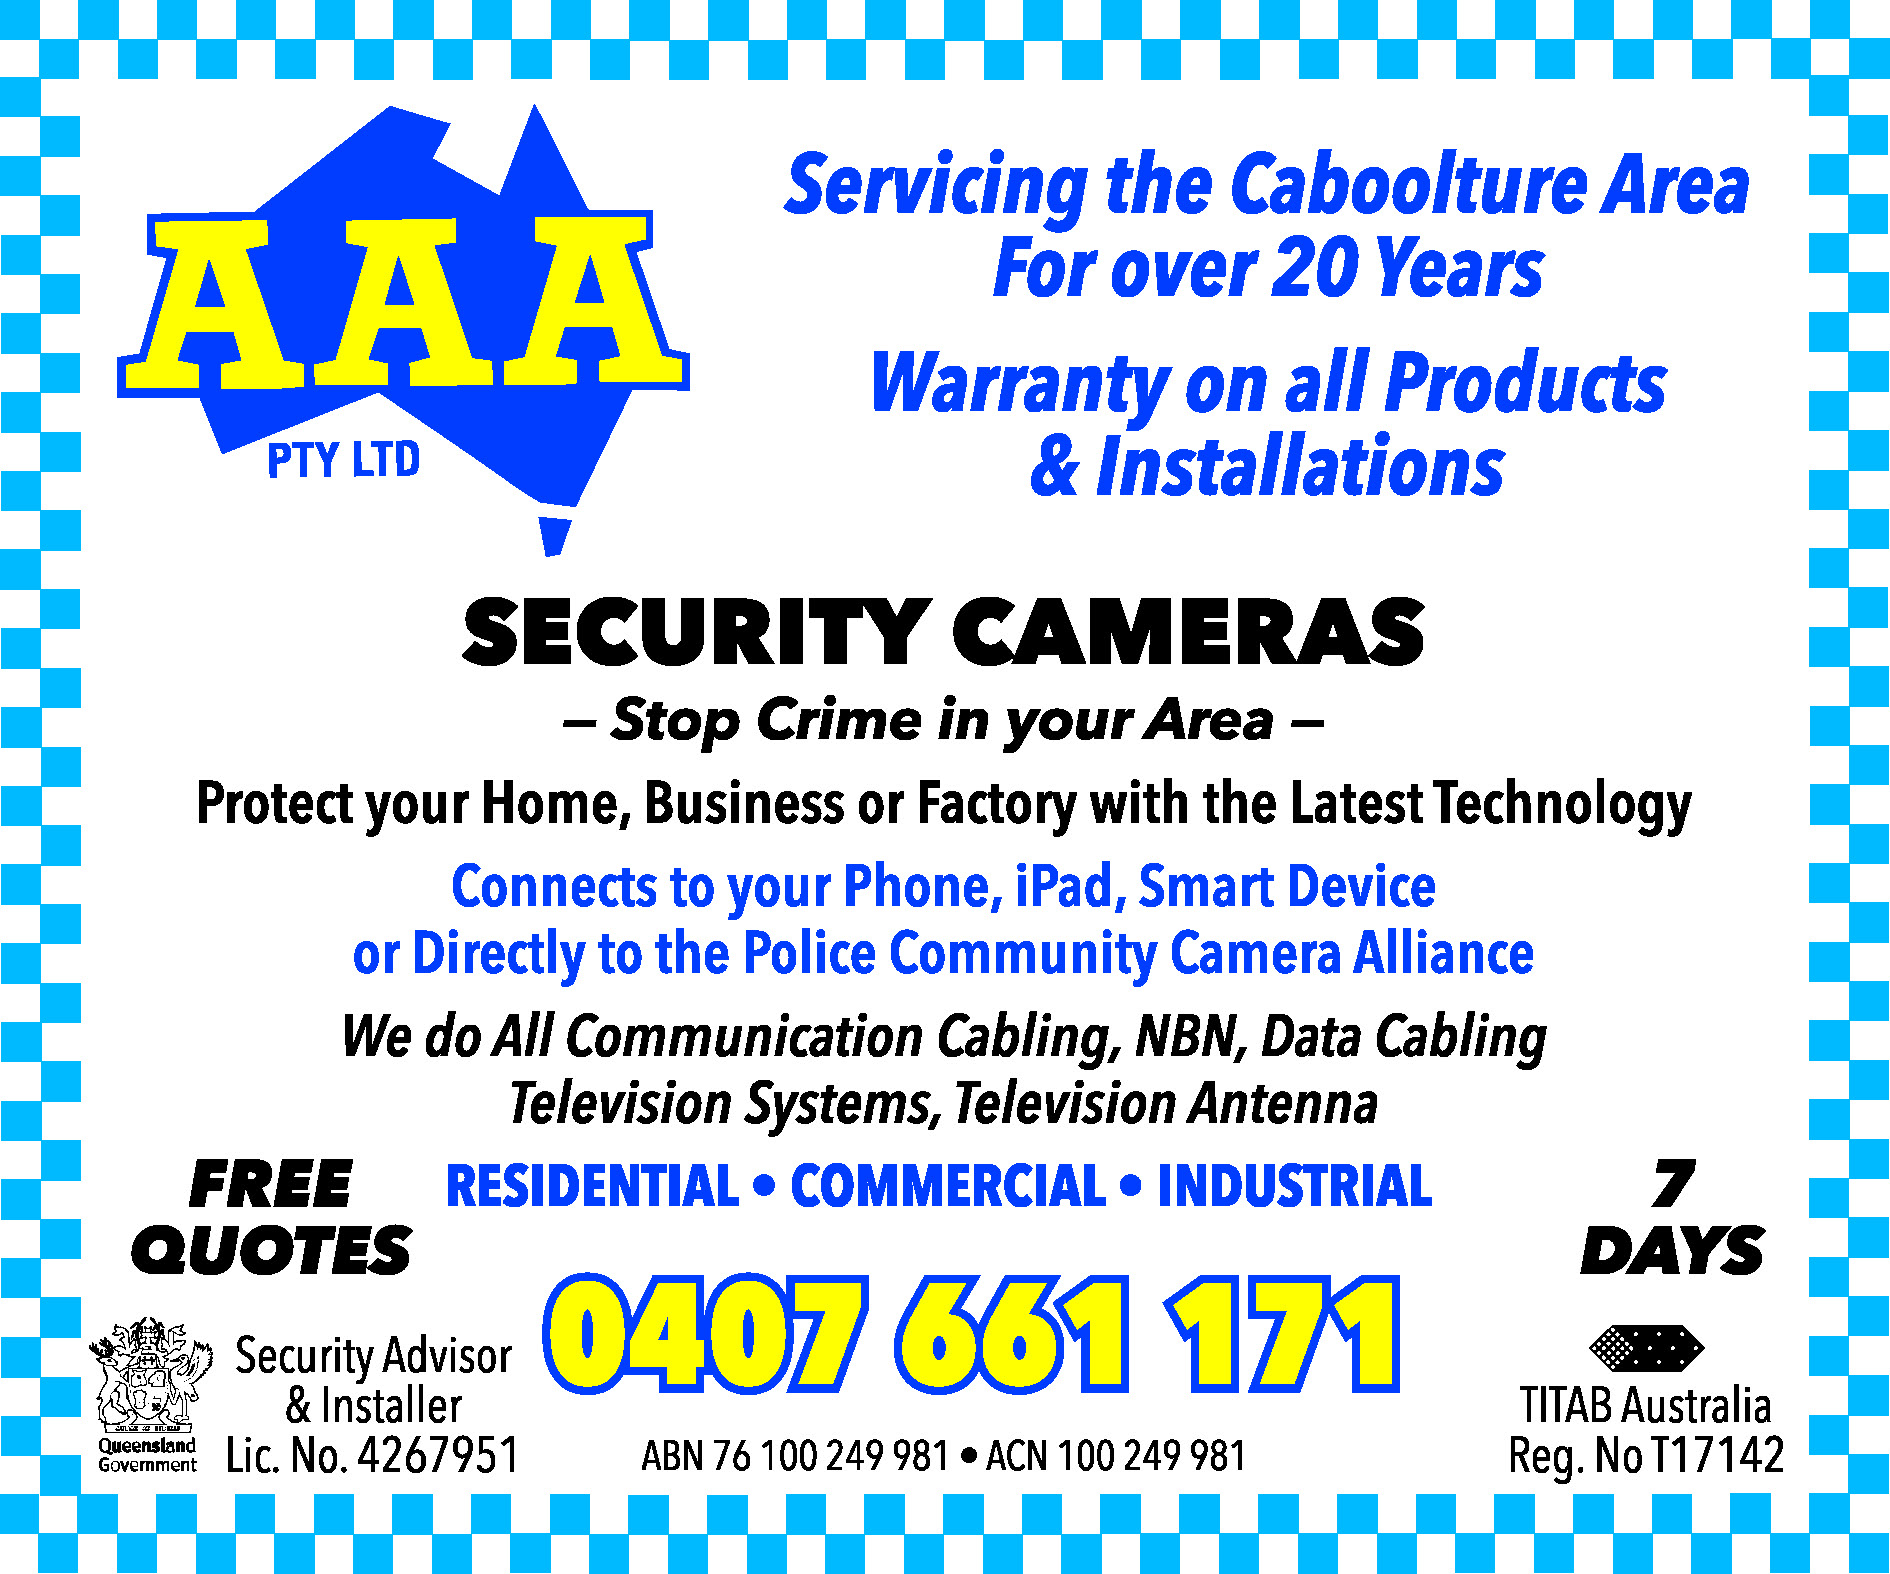 AAA Pty Ltd - Security